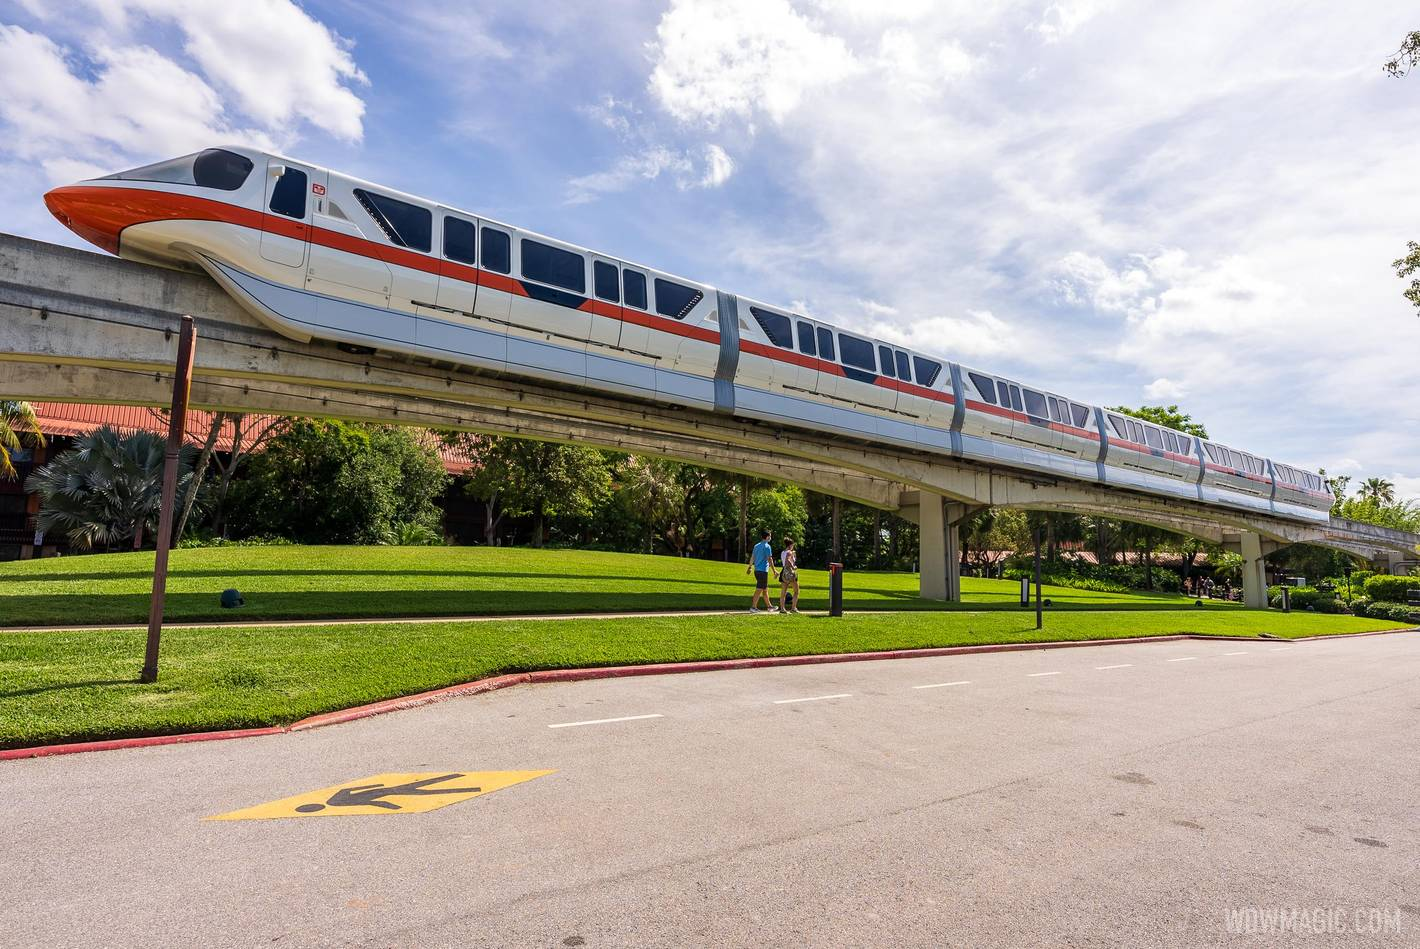 Monorail Orange on the Express Beam passes by Disney's Polynesian Village Resort